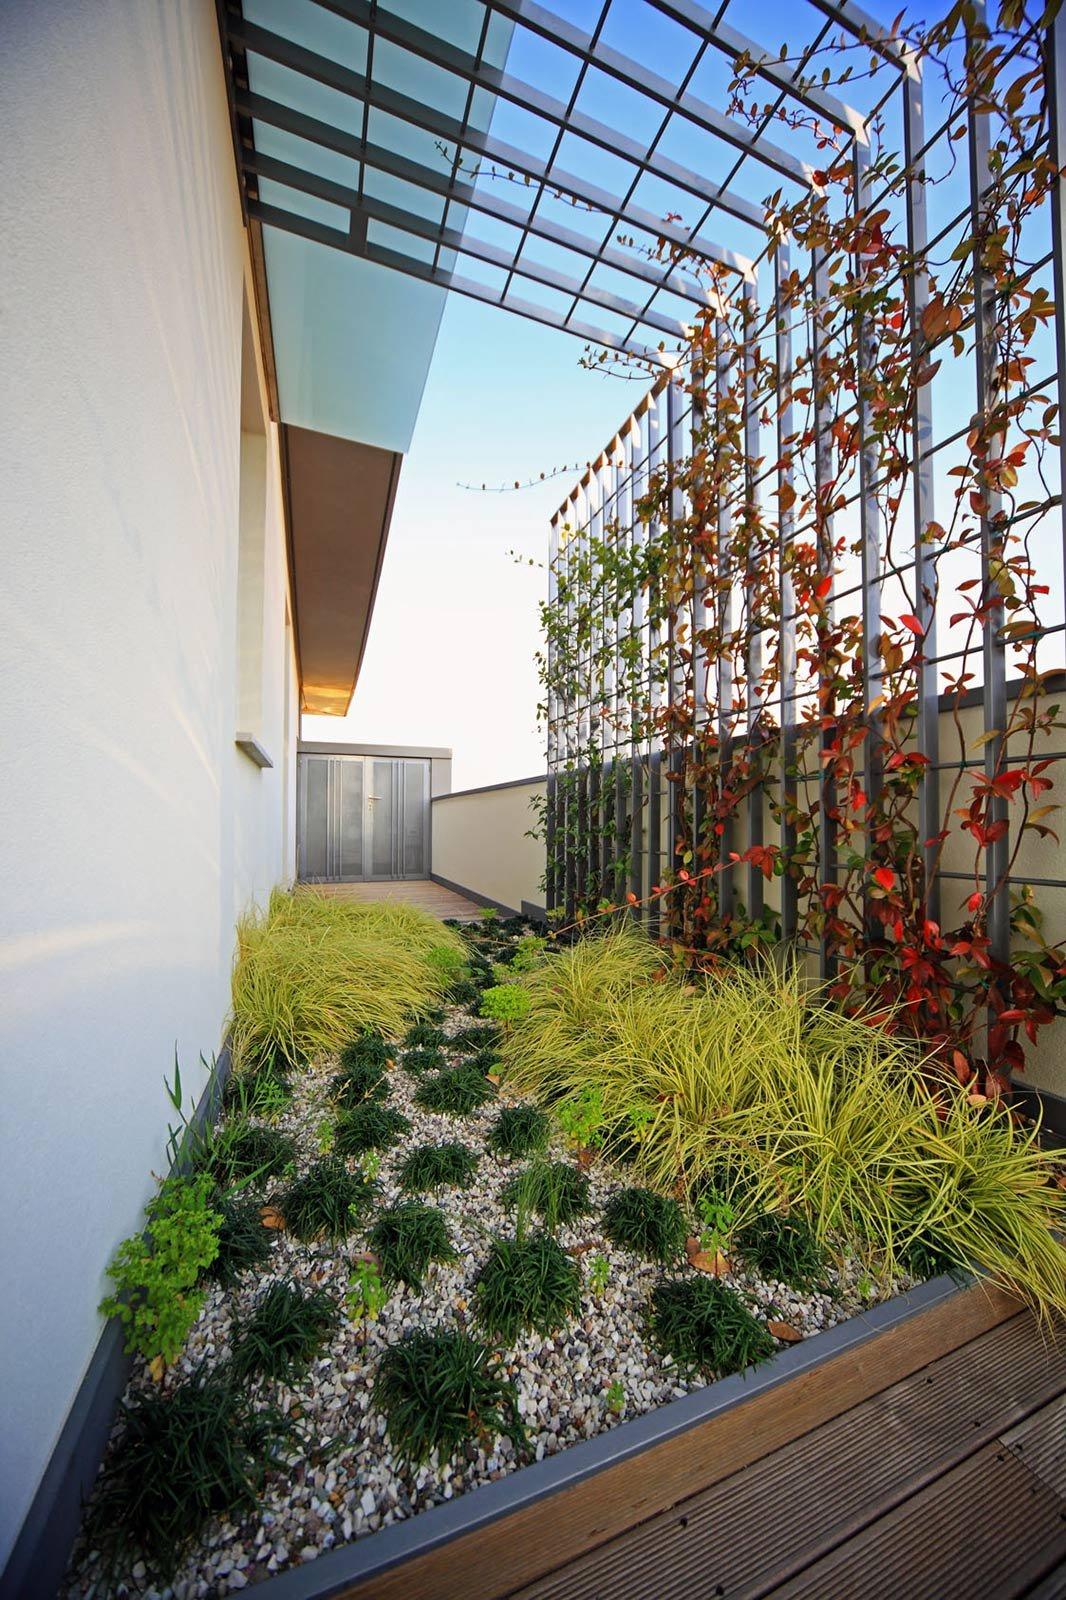 Giardino pensile oasi verdi in citt cose di casa for Giardino pensile